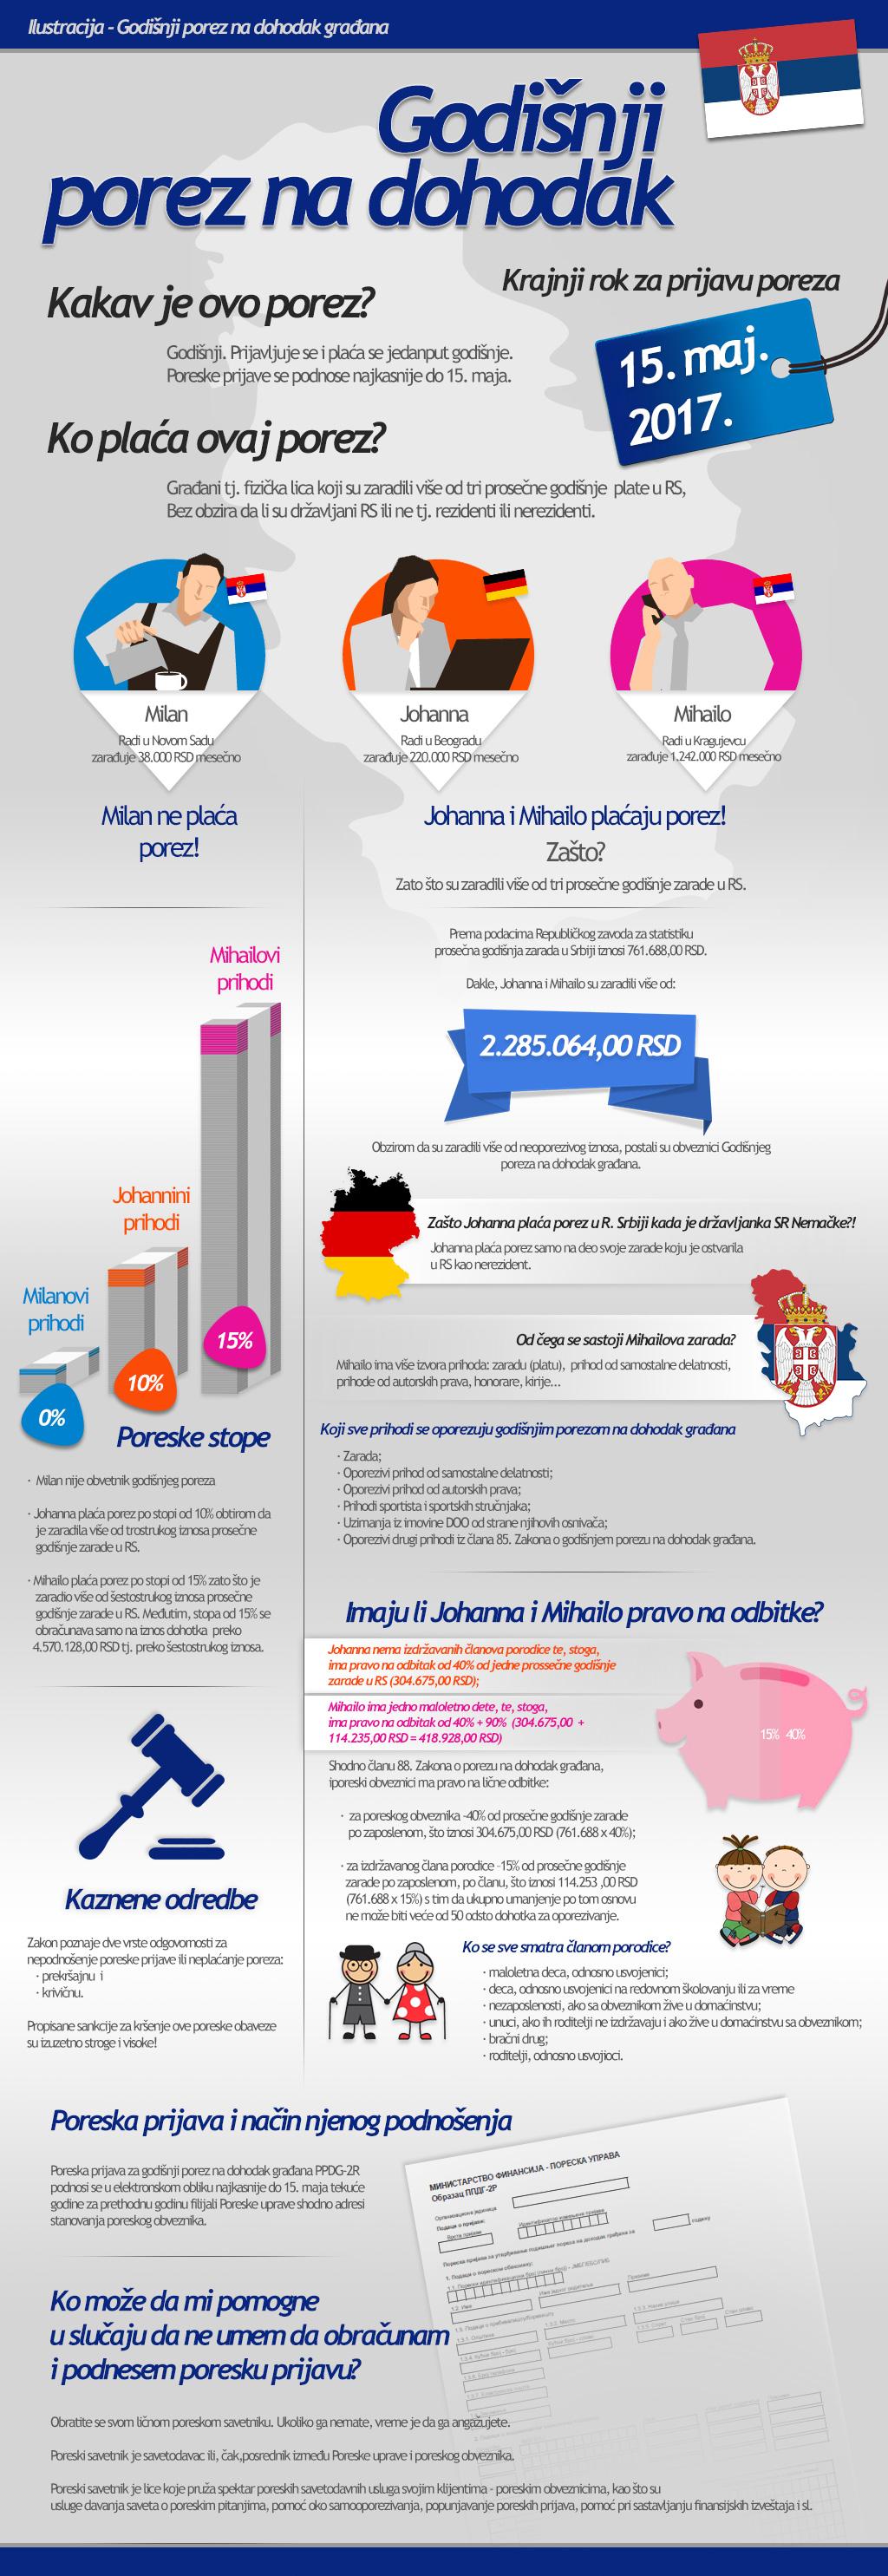 Porez na dohodak, infografik, klikni na infografik za maksimalnu rezoluciju